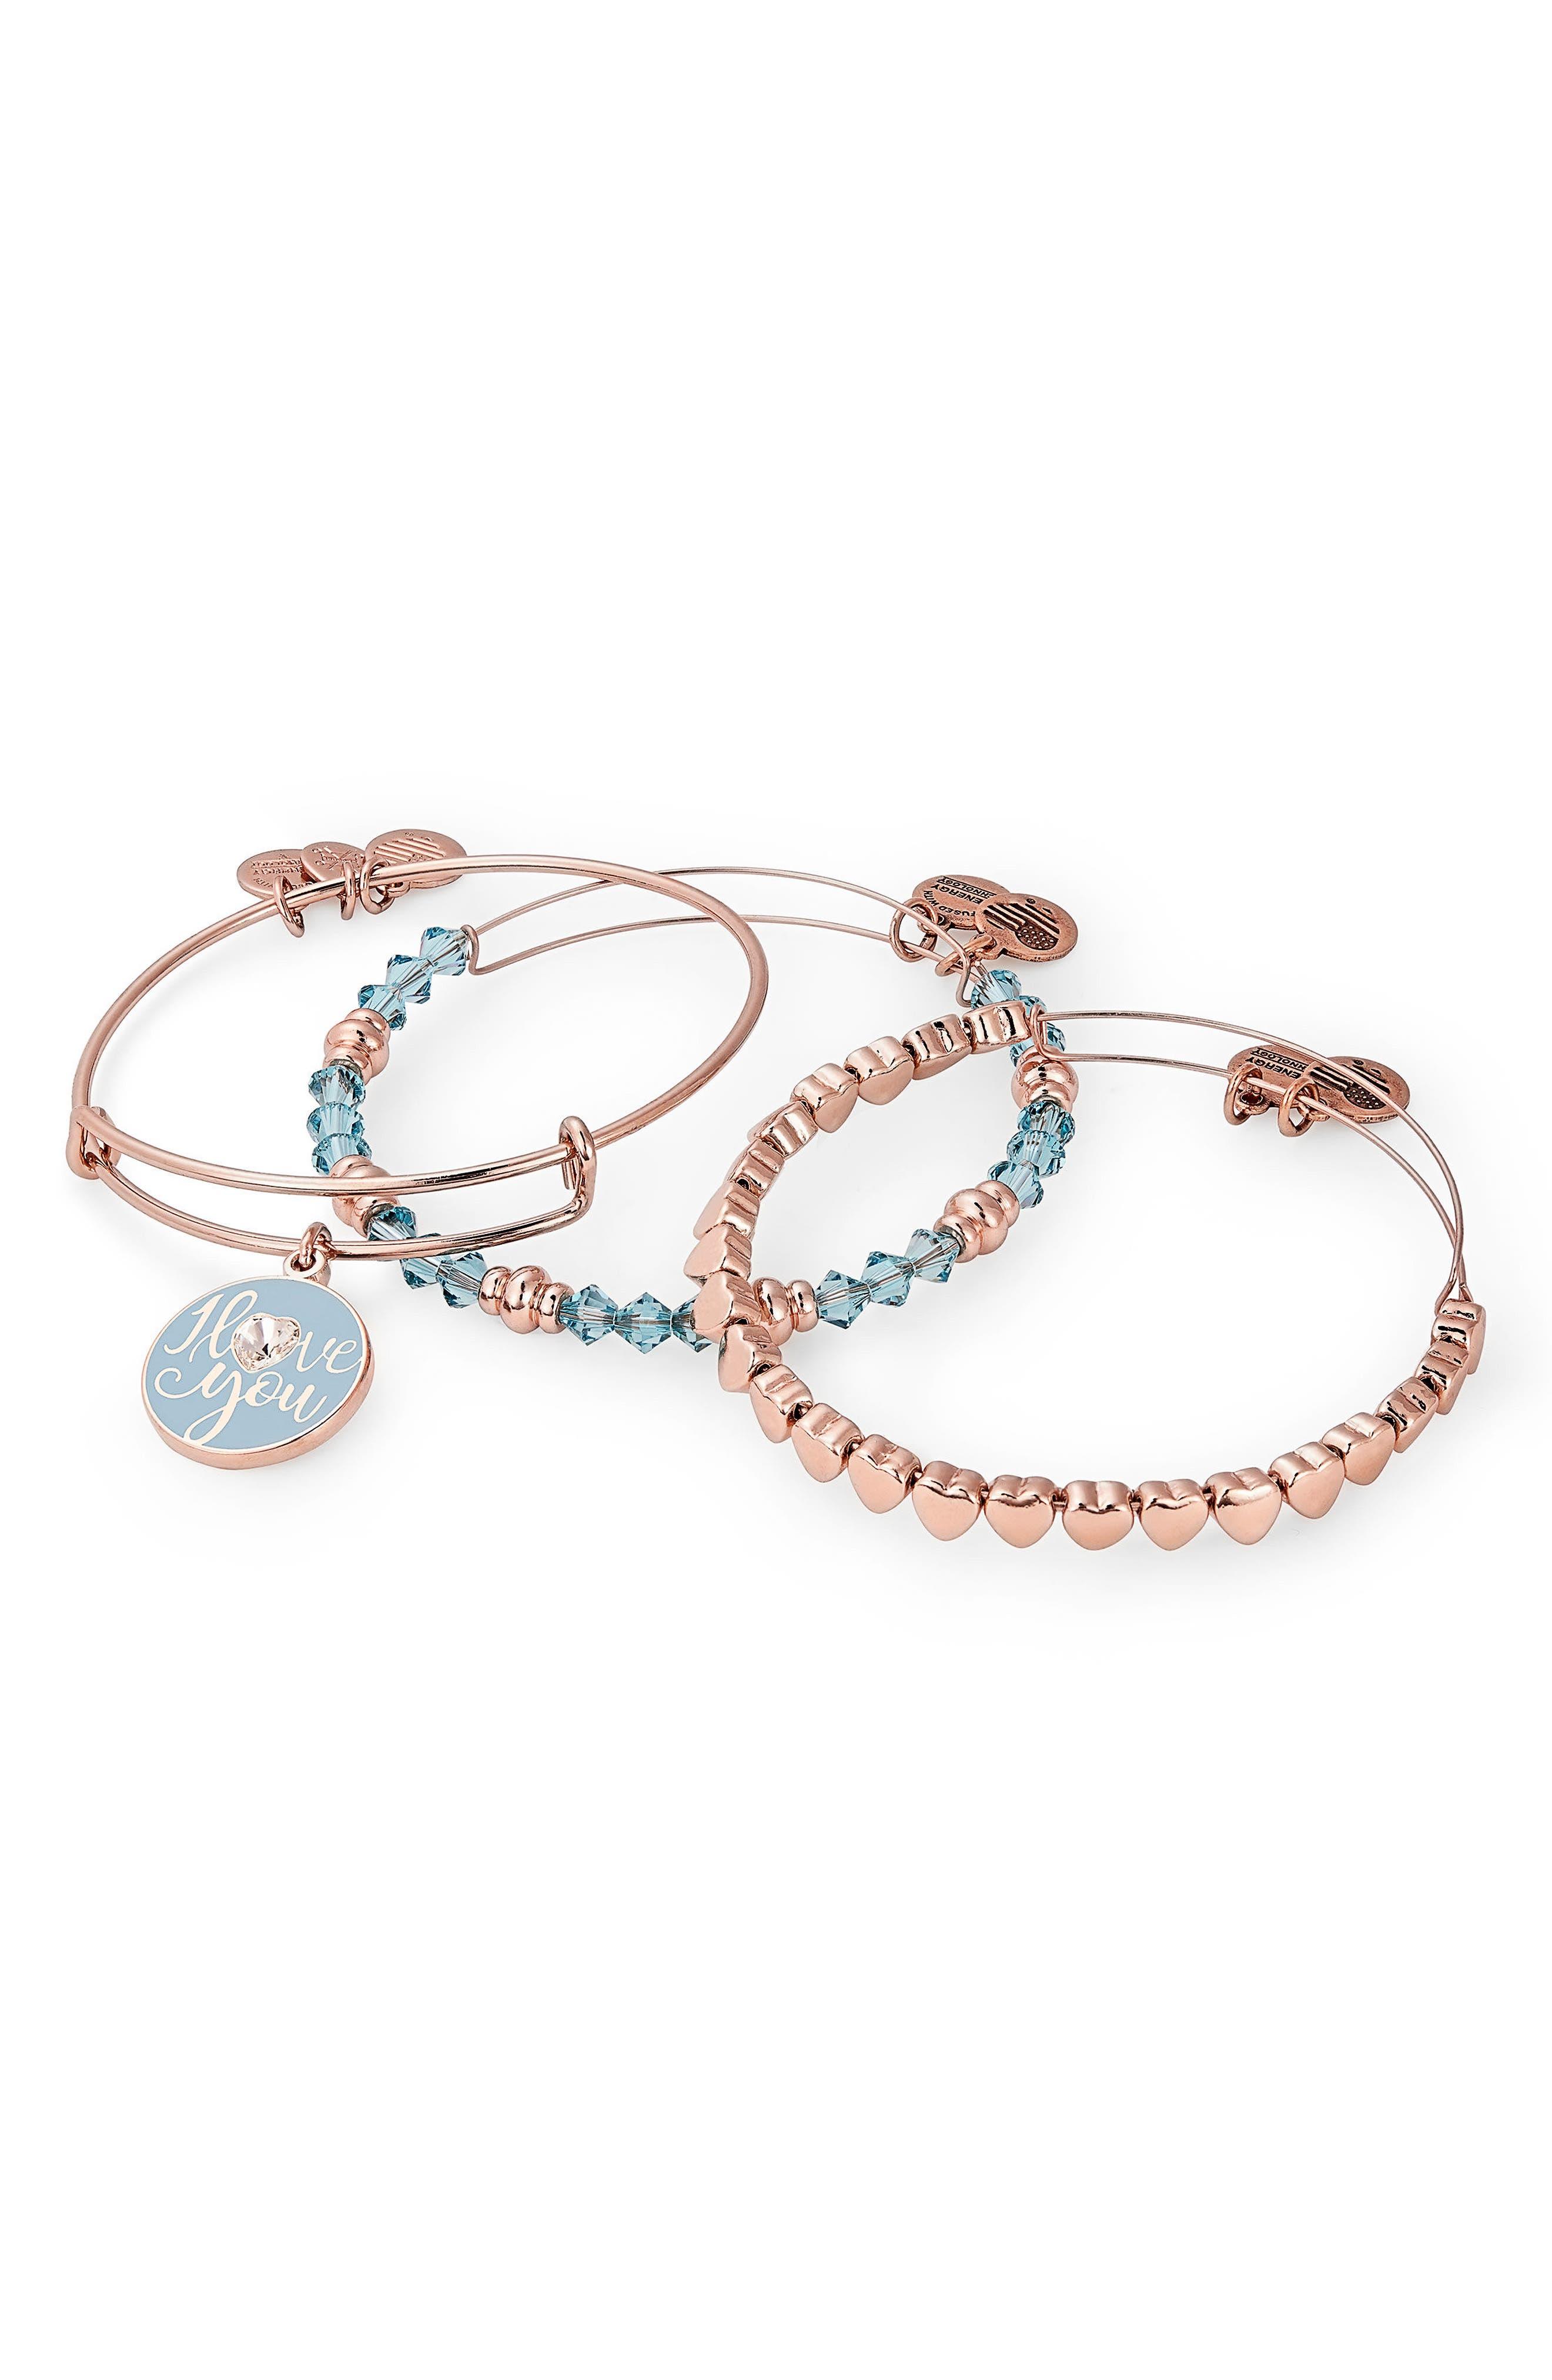 I Love You Set of 3 Adjustable Wire Bangles,                         Main,                         color, Rose Gold